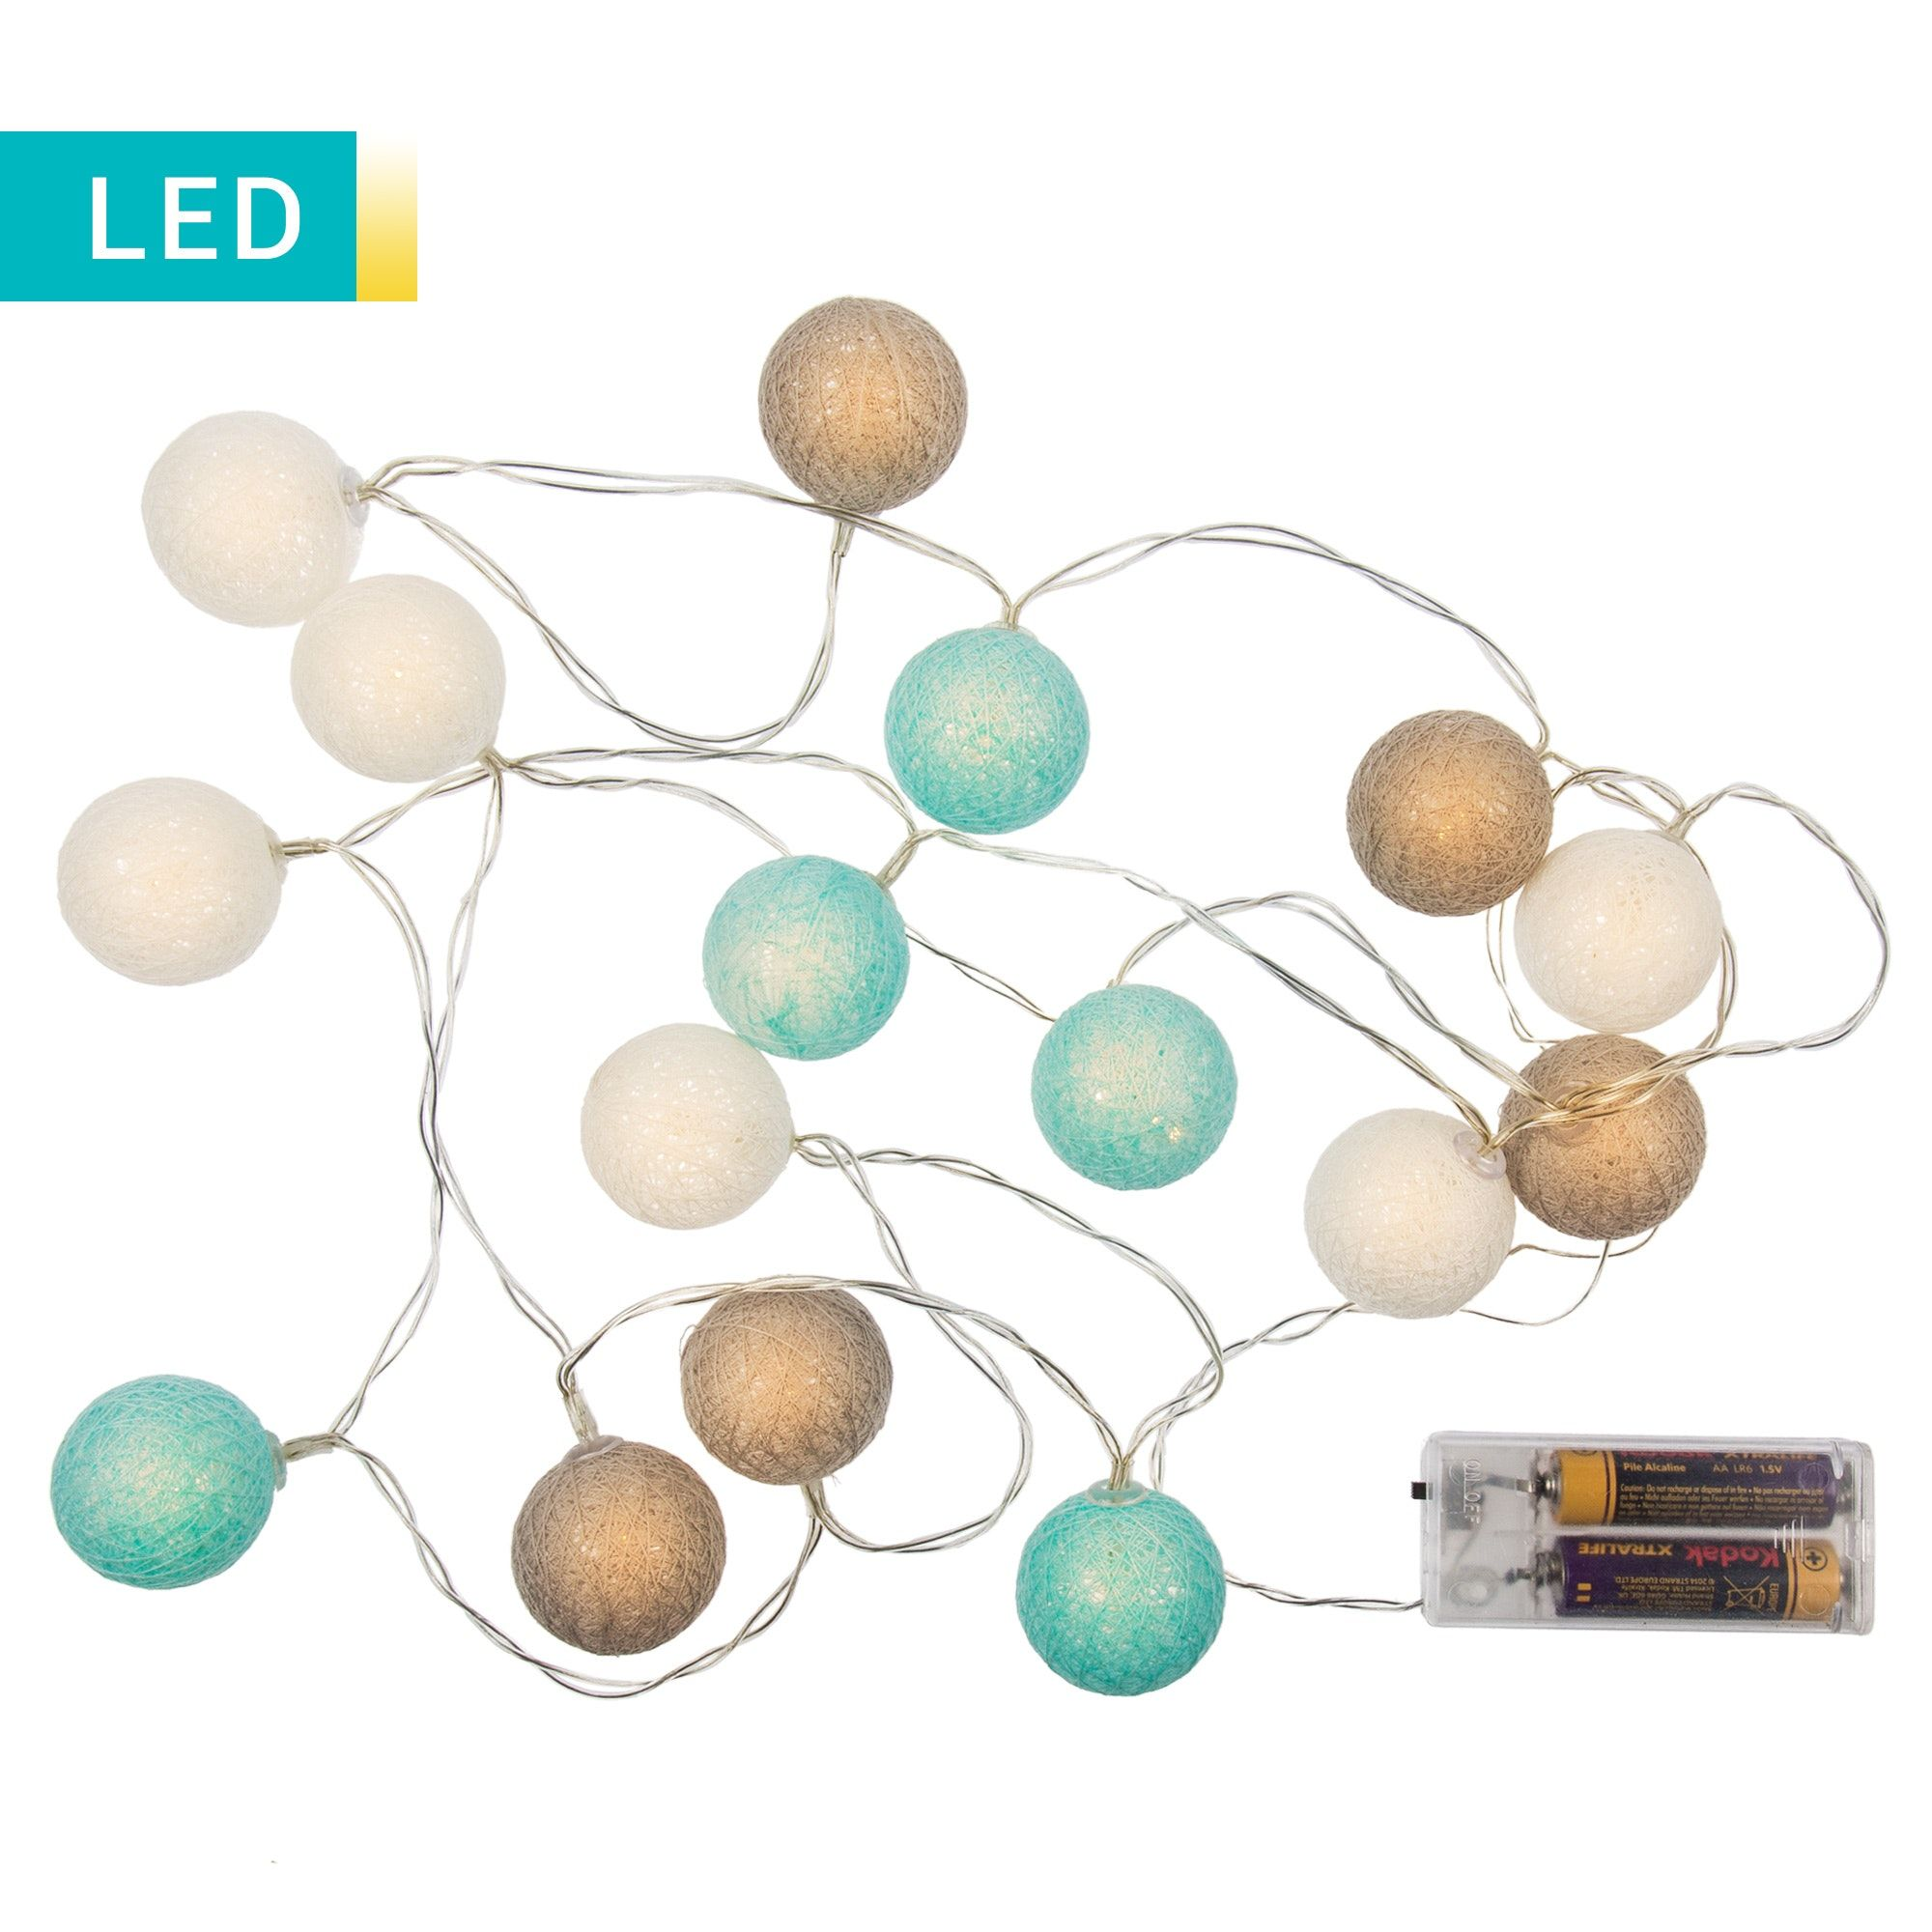 Led-lichterketten ledlichterkette mit farbigen kugeln  adihome  pinterest